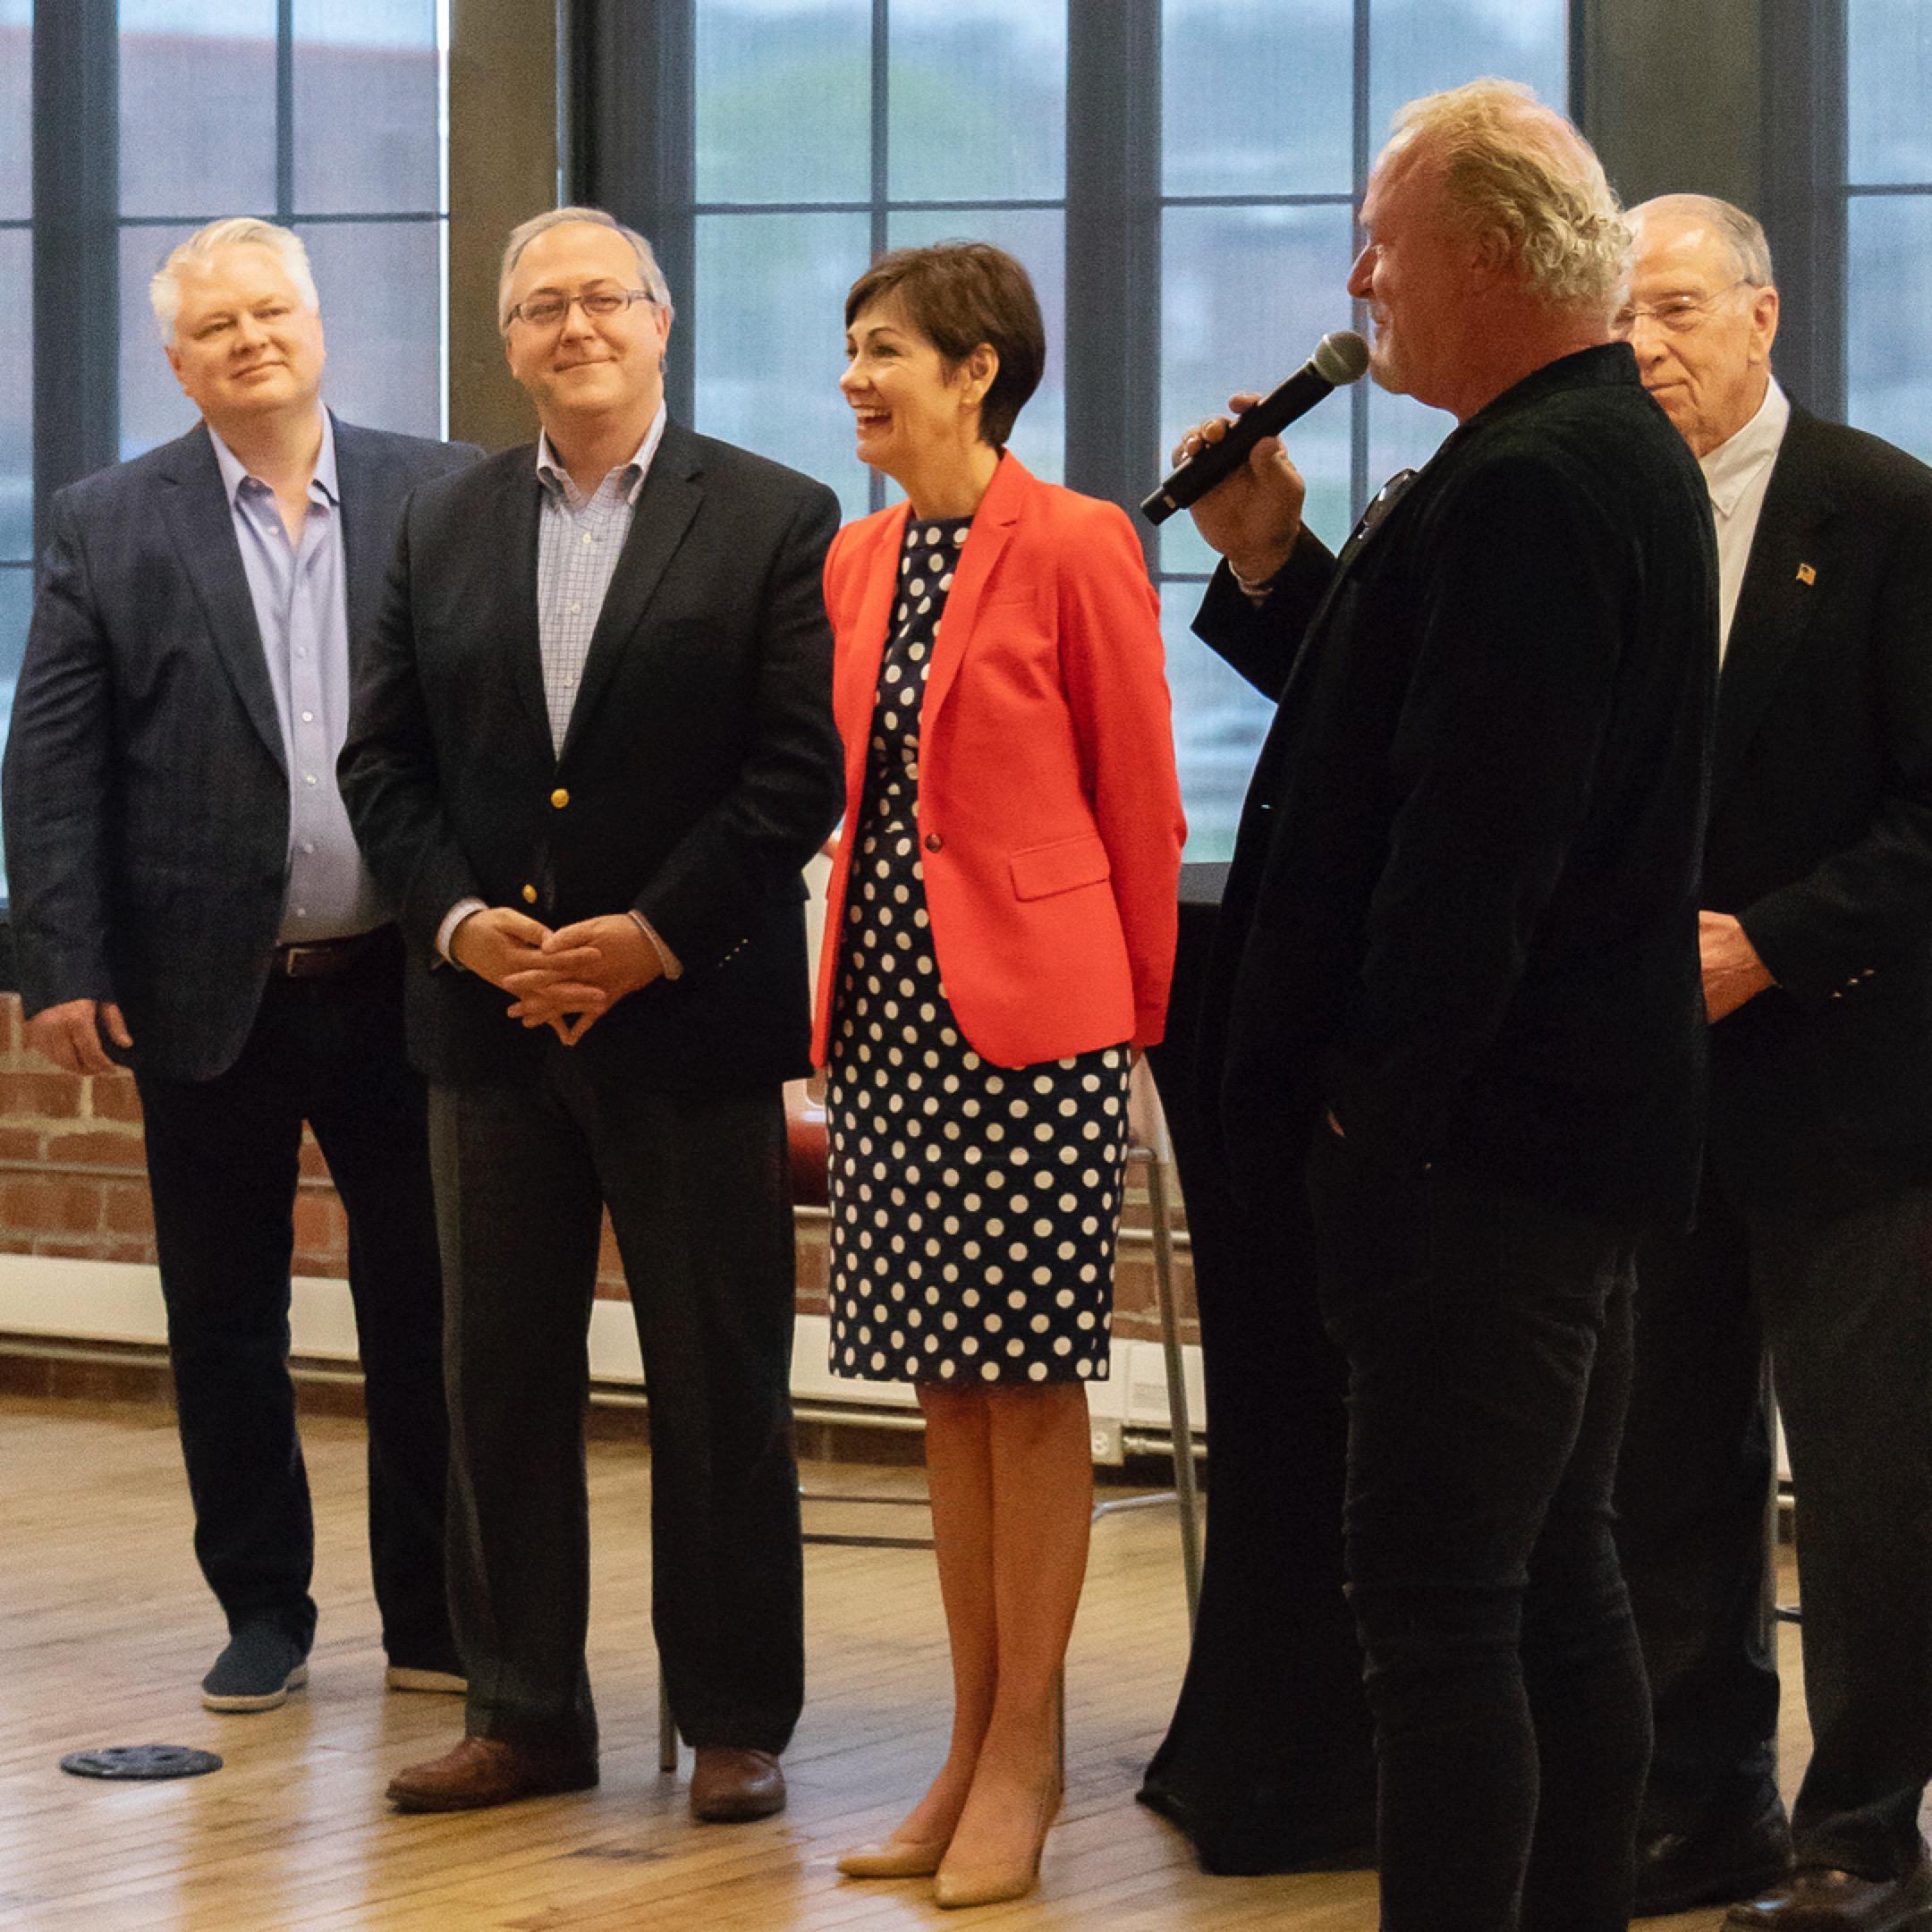 Linc Kroeger, Congressman David Young, Governor Kim Reynolds, Pillar Technology CEO Bob Myers, and Senator Chuck Grassley at The Forge